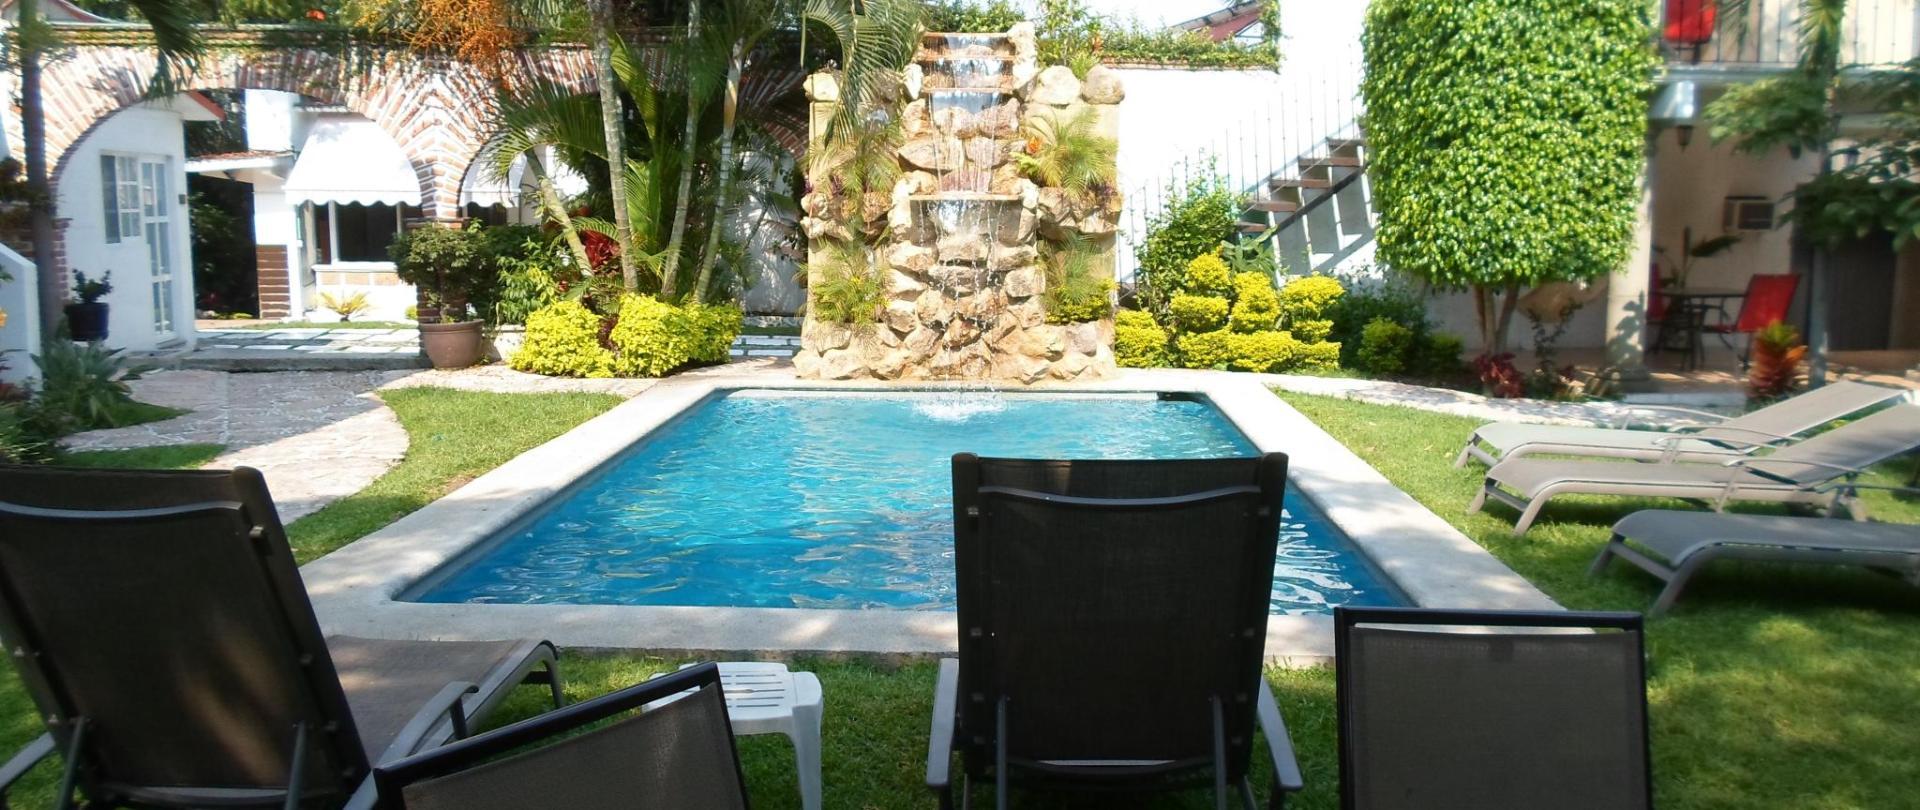 Hotel Finca Chipitlan